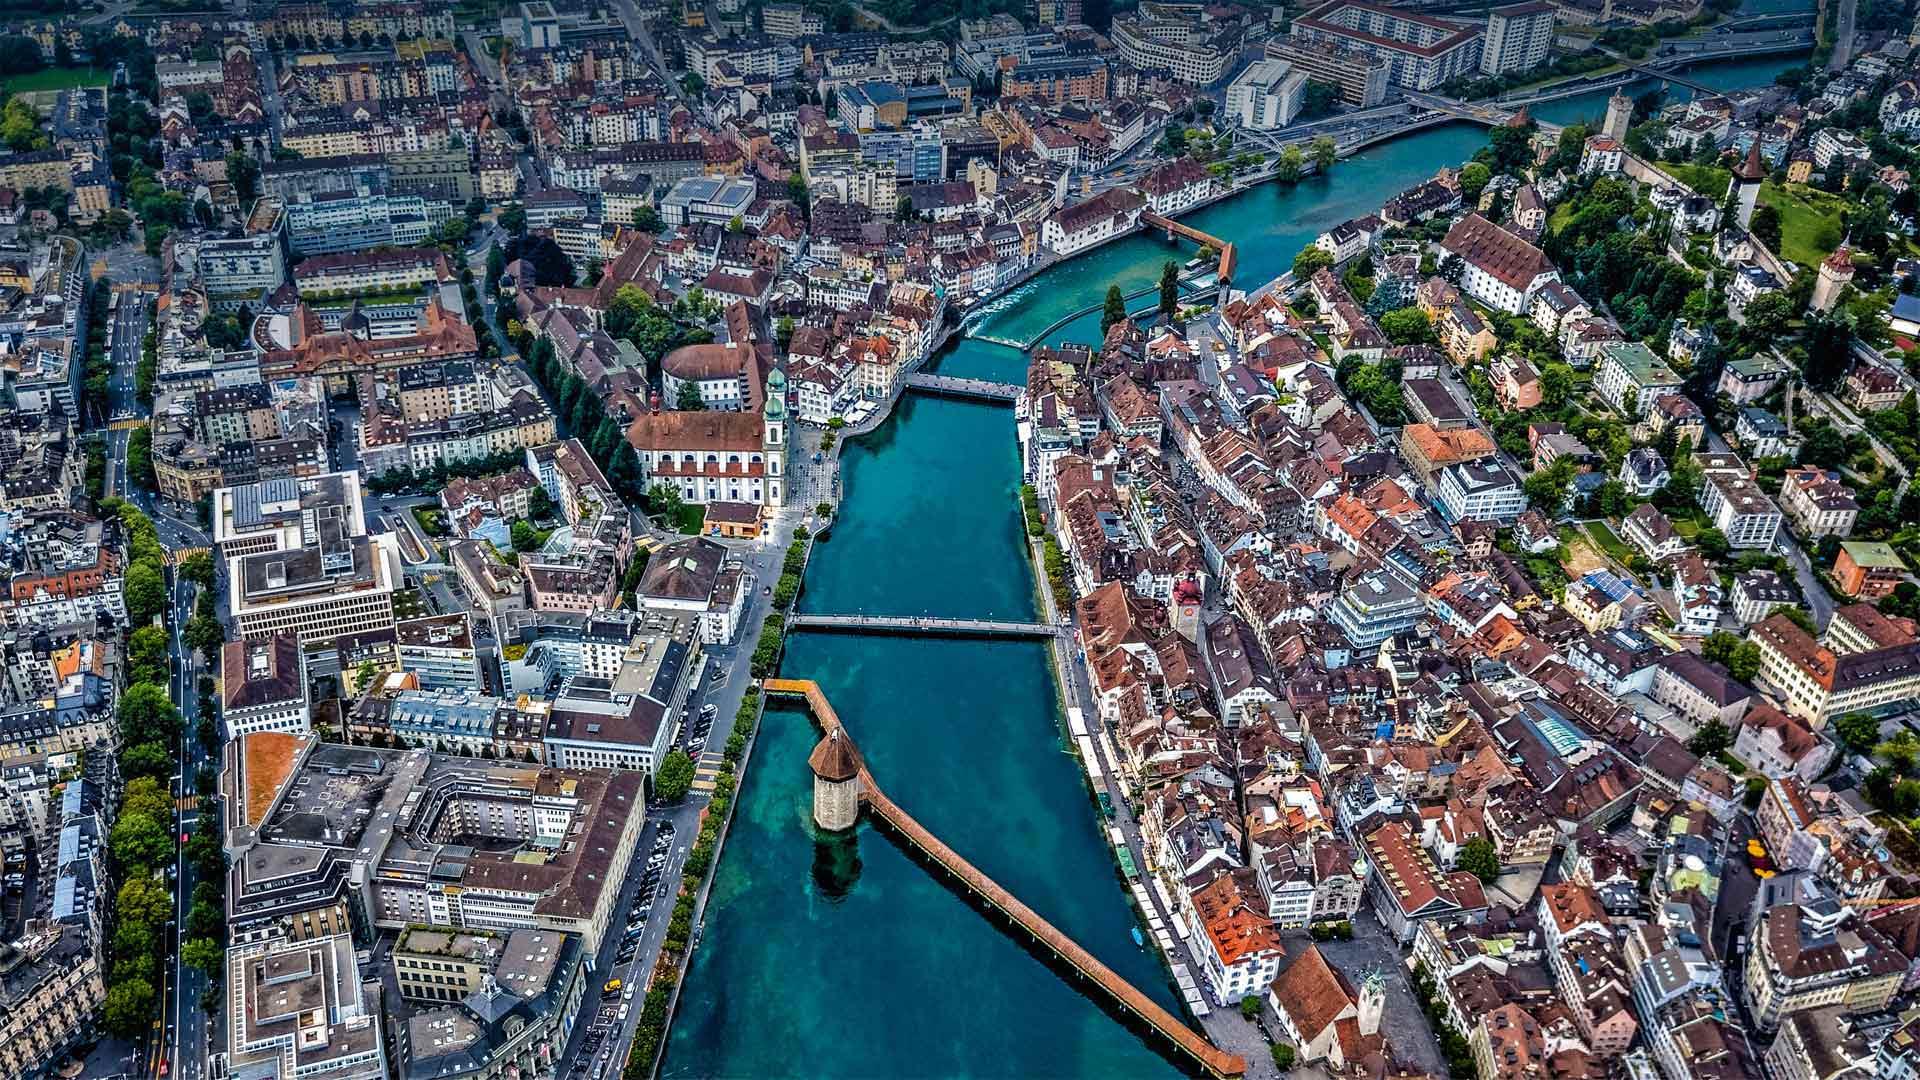 Aerial view of Chapel Bridge over the river Reuss in Lucerne, Switzerland (© Neleman Initiative/Gallery Stock)